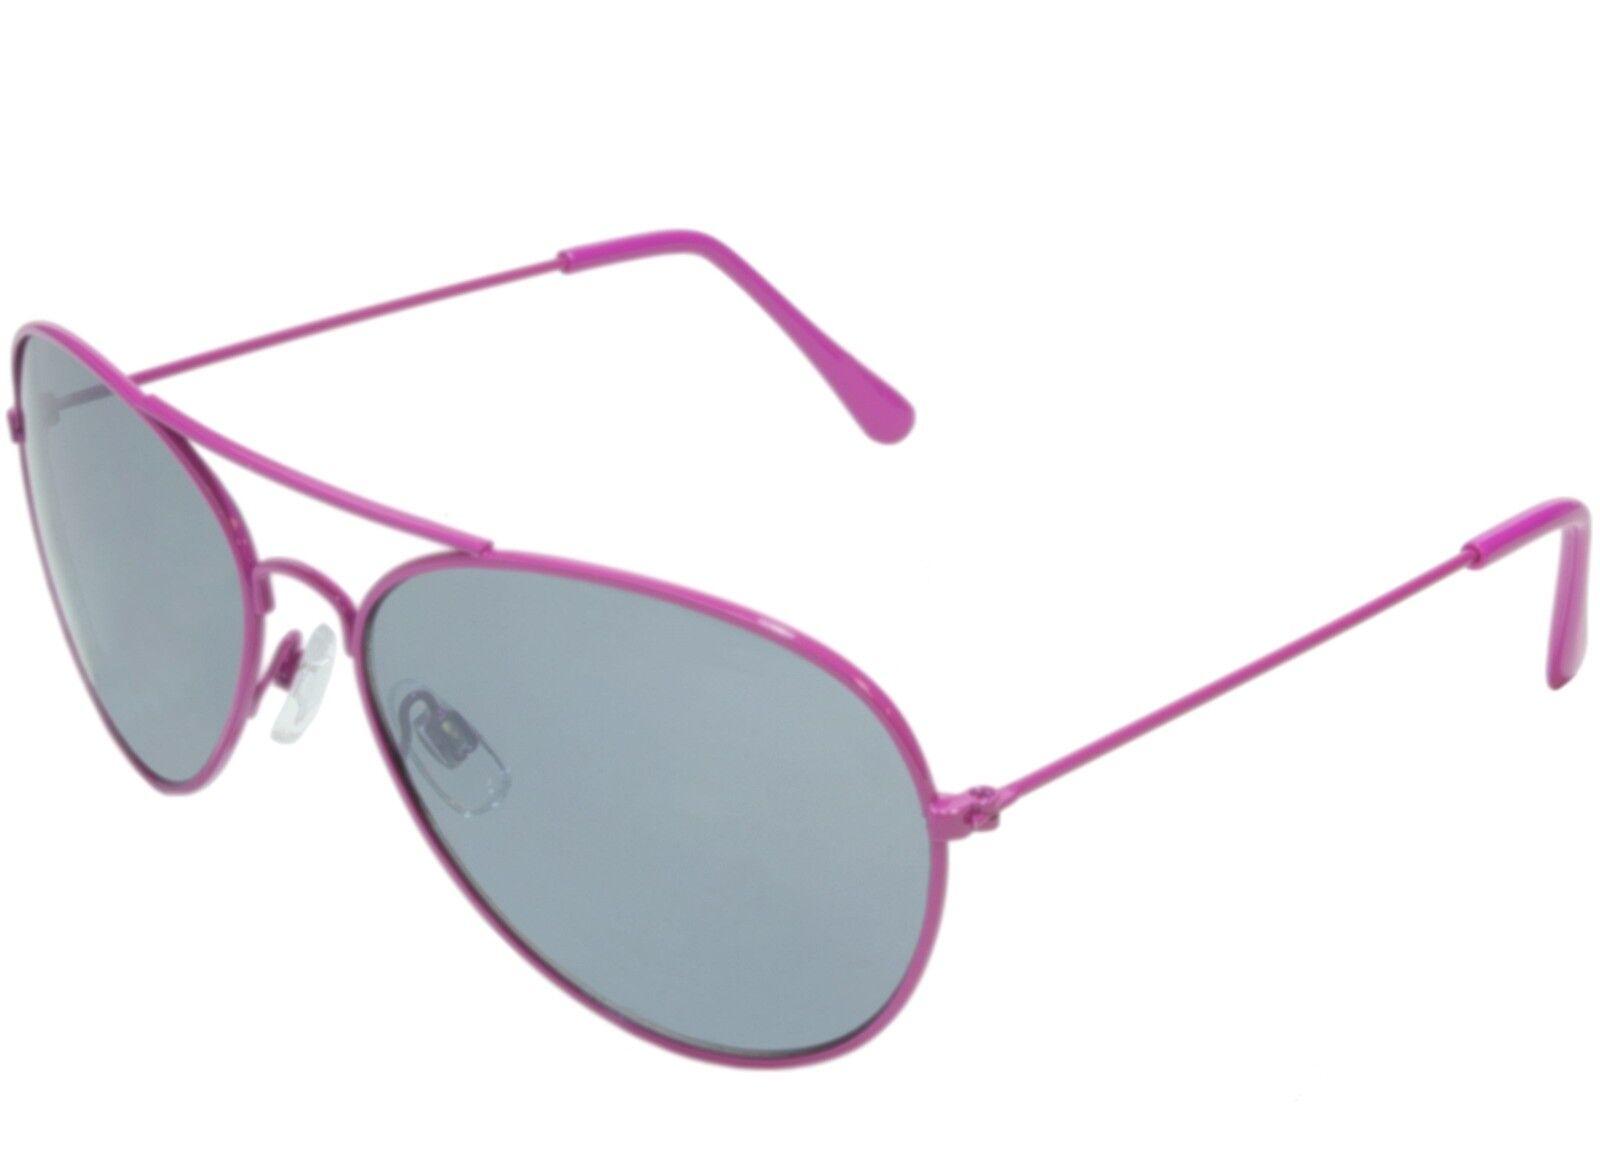 Womens Small 51mm Aviator Sunglasses Wire Frame Purple Gray Lens | eBay